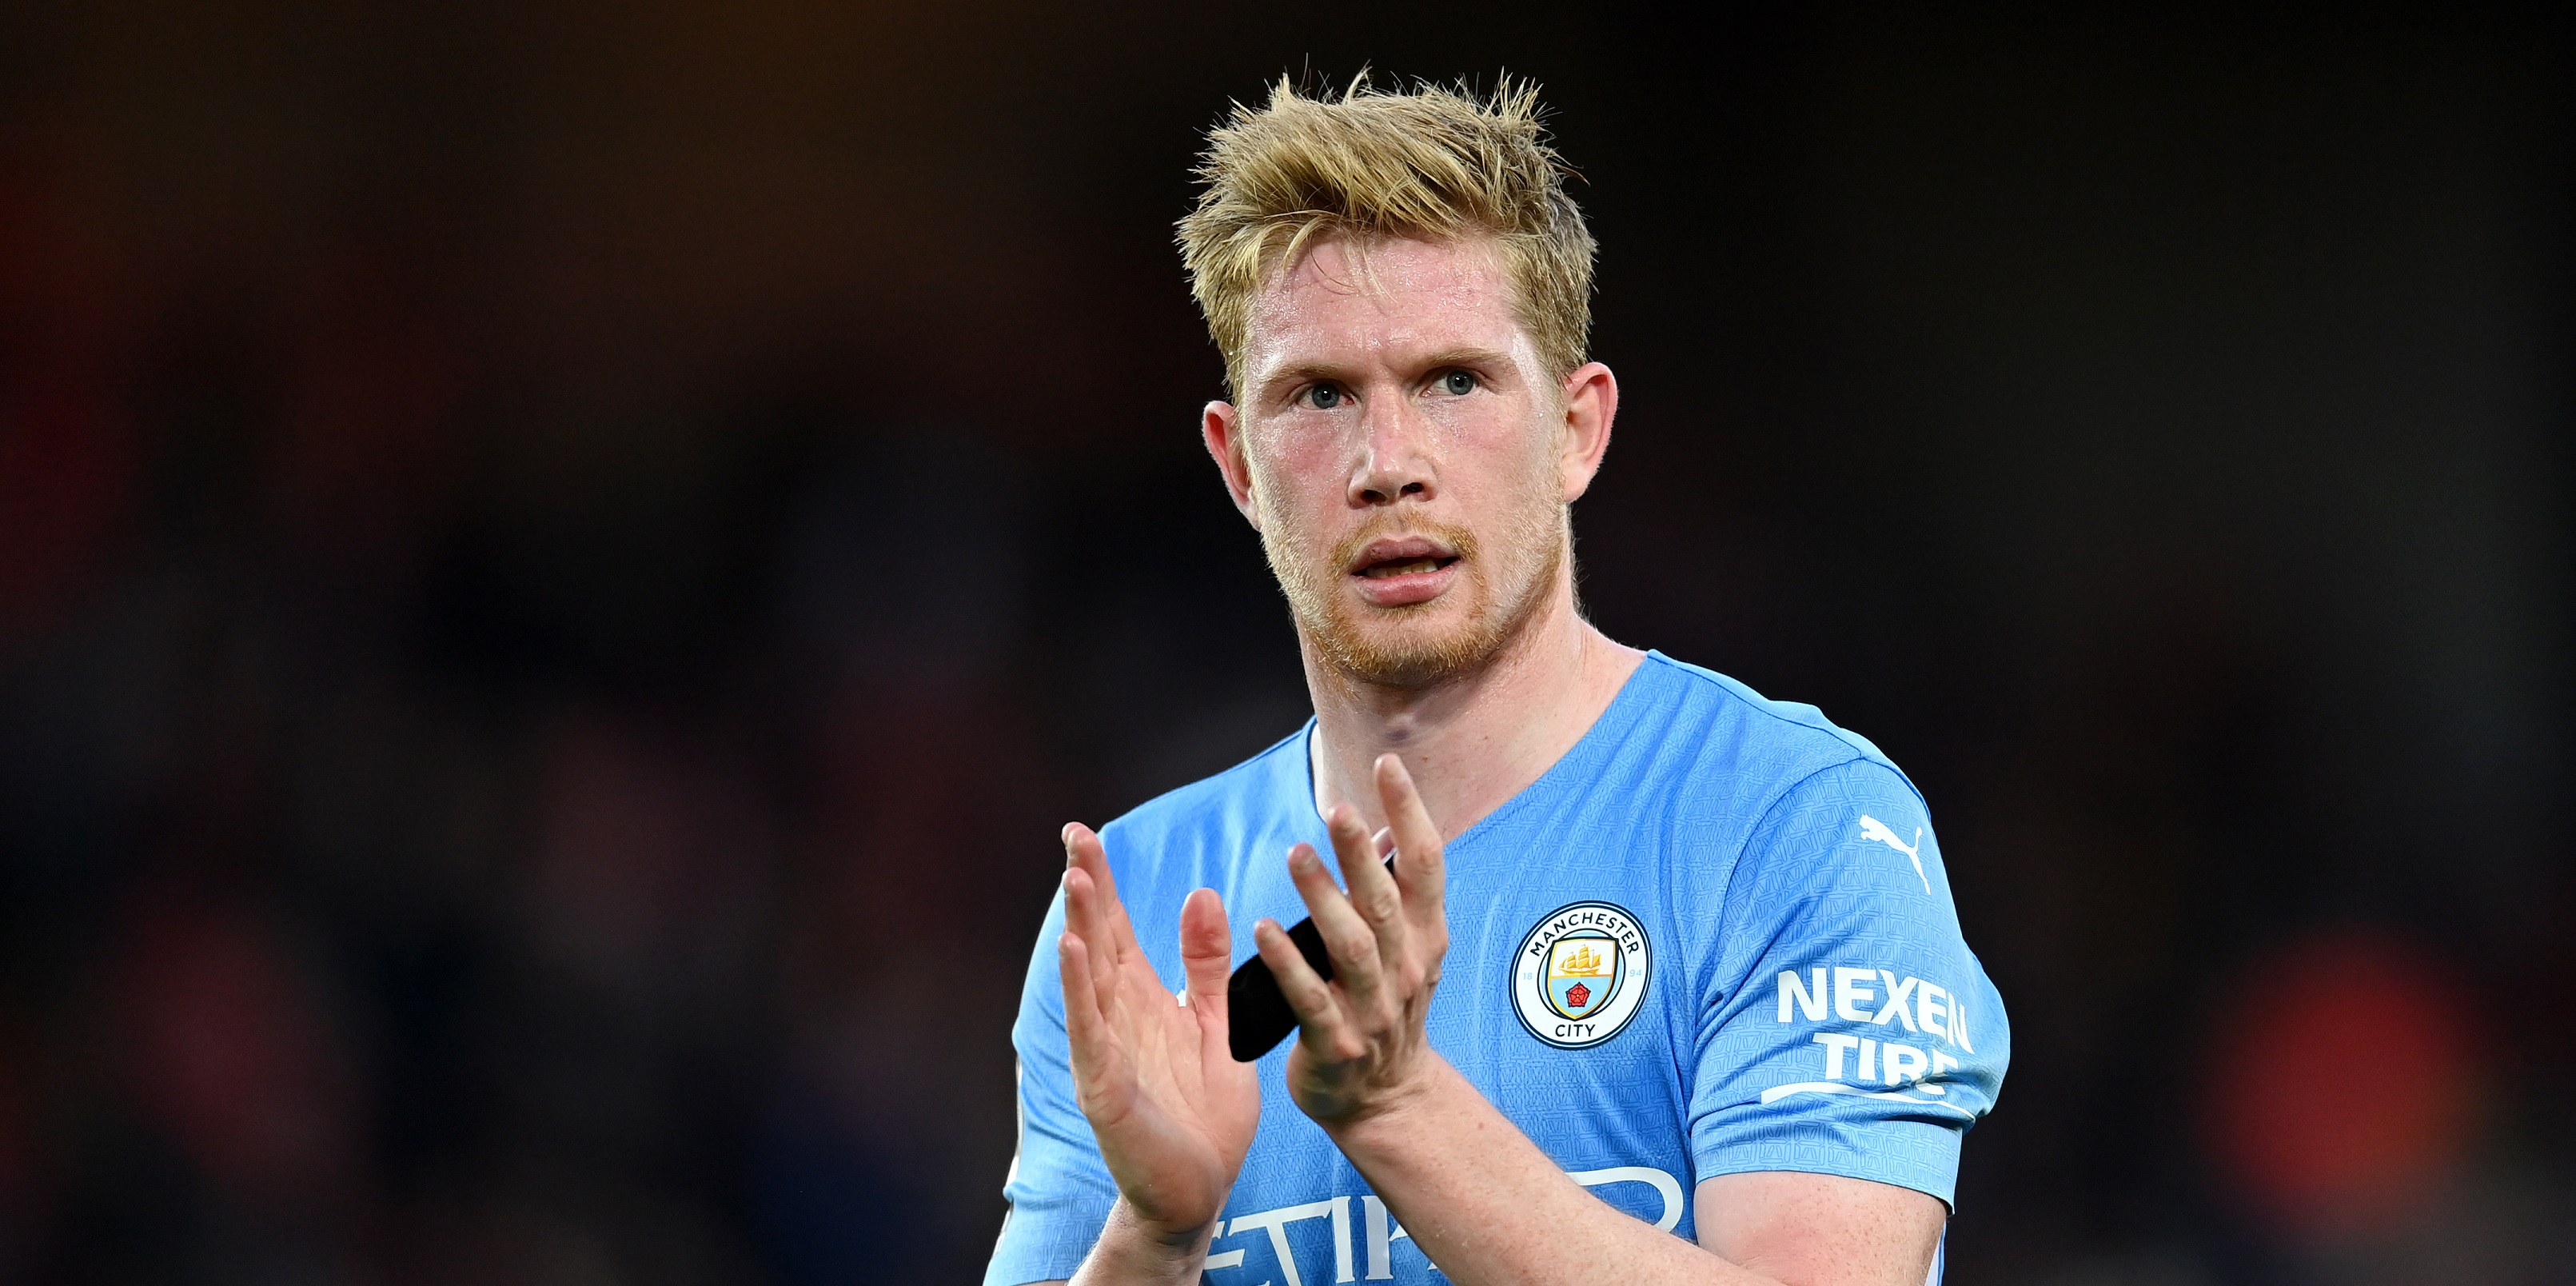 Man City post 'justice' tweet following De Bruyne's equaliser in Liverpool draw